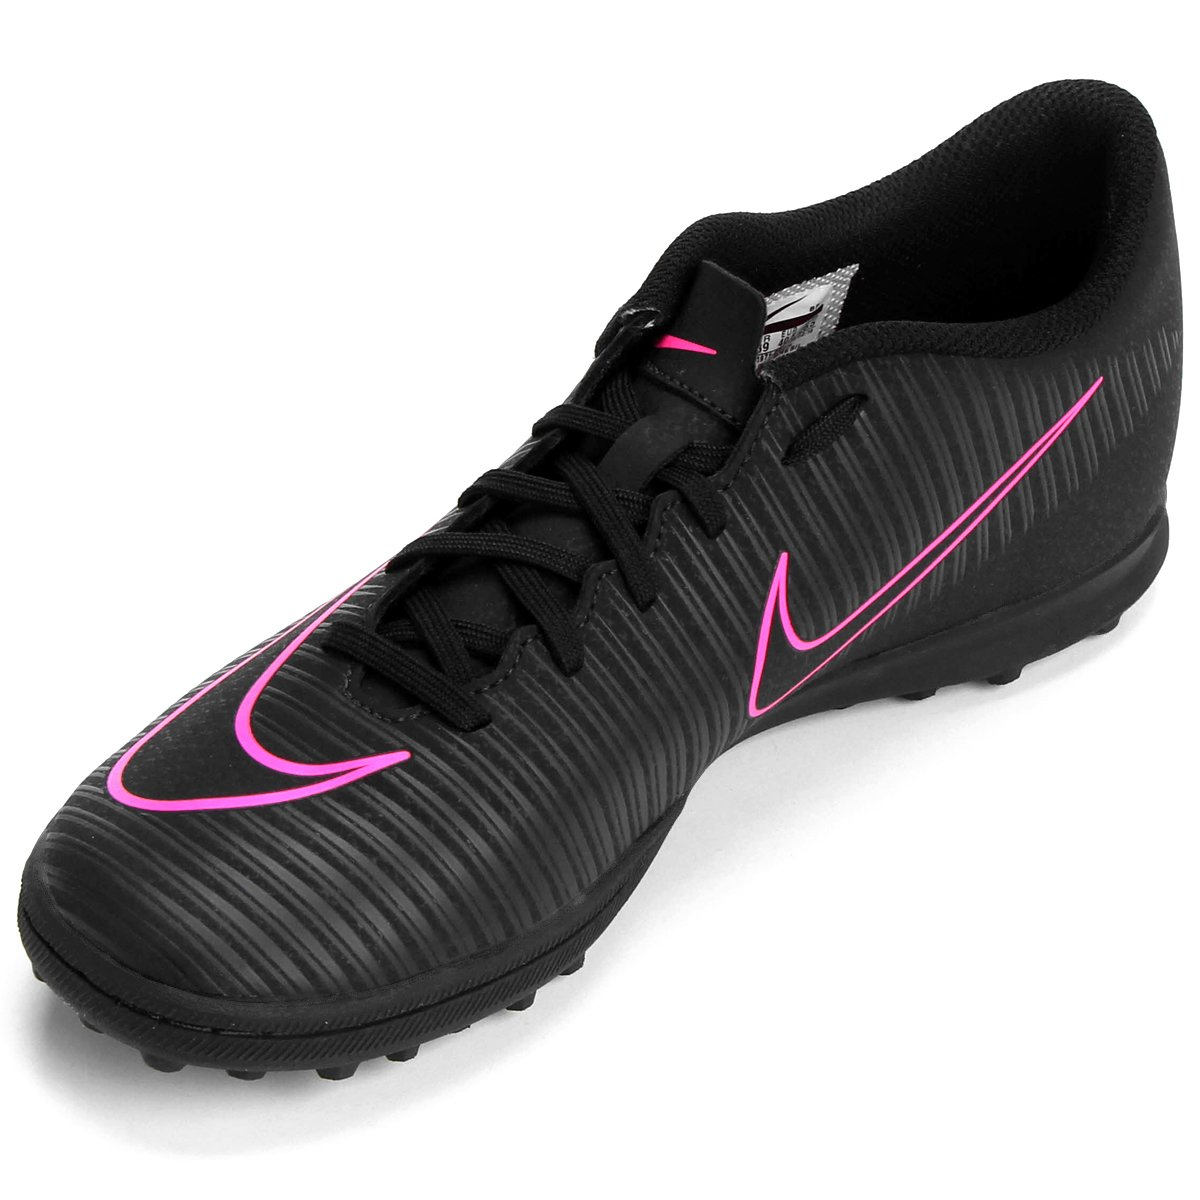 Chuteira Society Nike Mercurial Vortex 3 TF - Preto e Rosa - Compre ... 1fd59edfad249